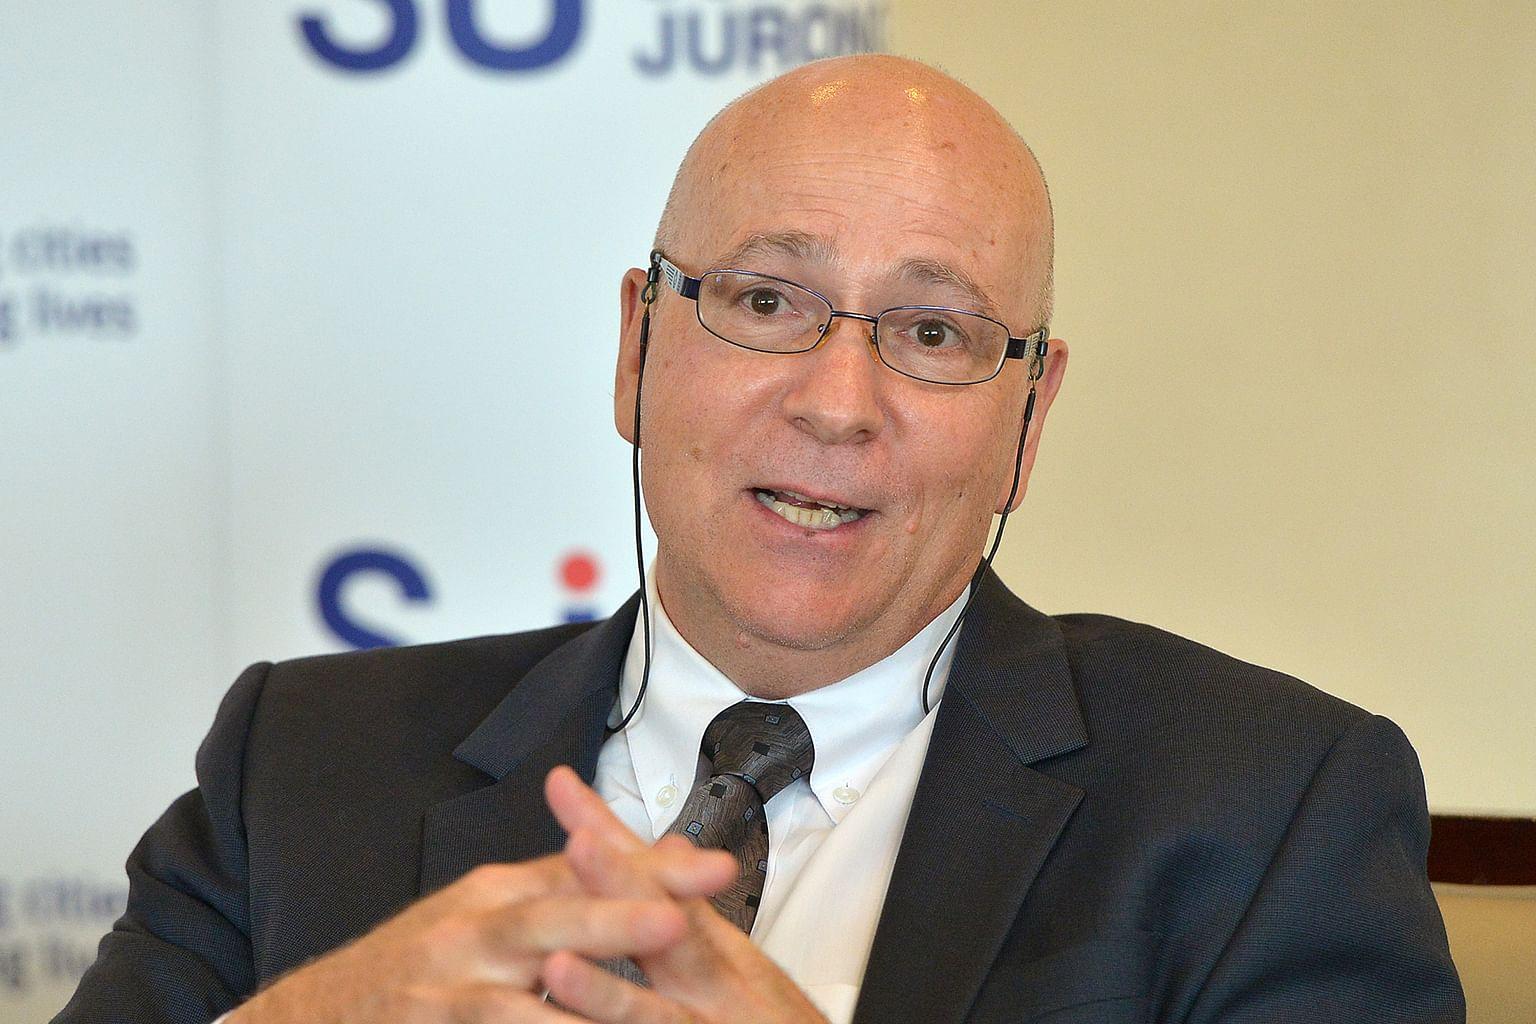 Singapore Surbana Jurong buys Australian SMEC to create consulting giant 50